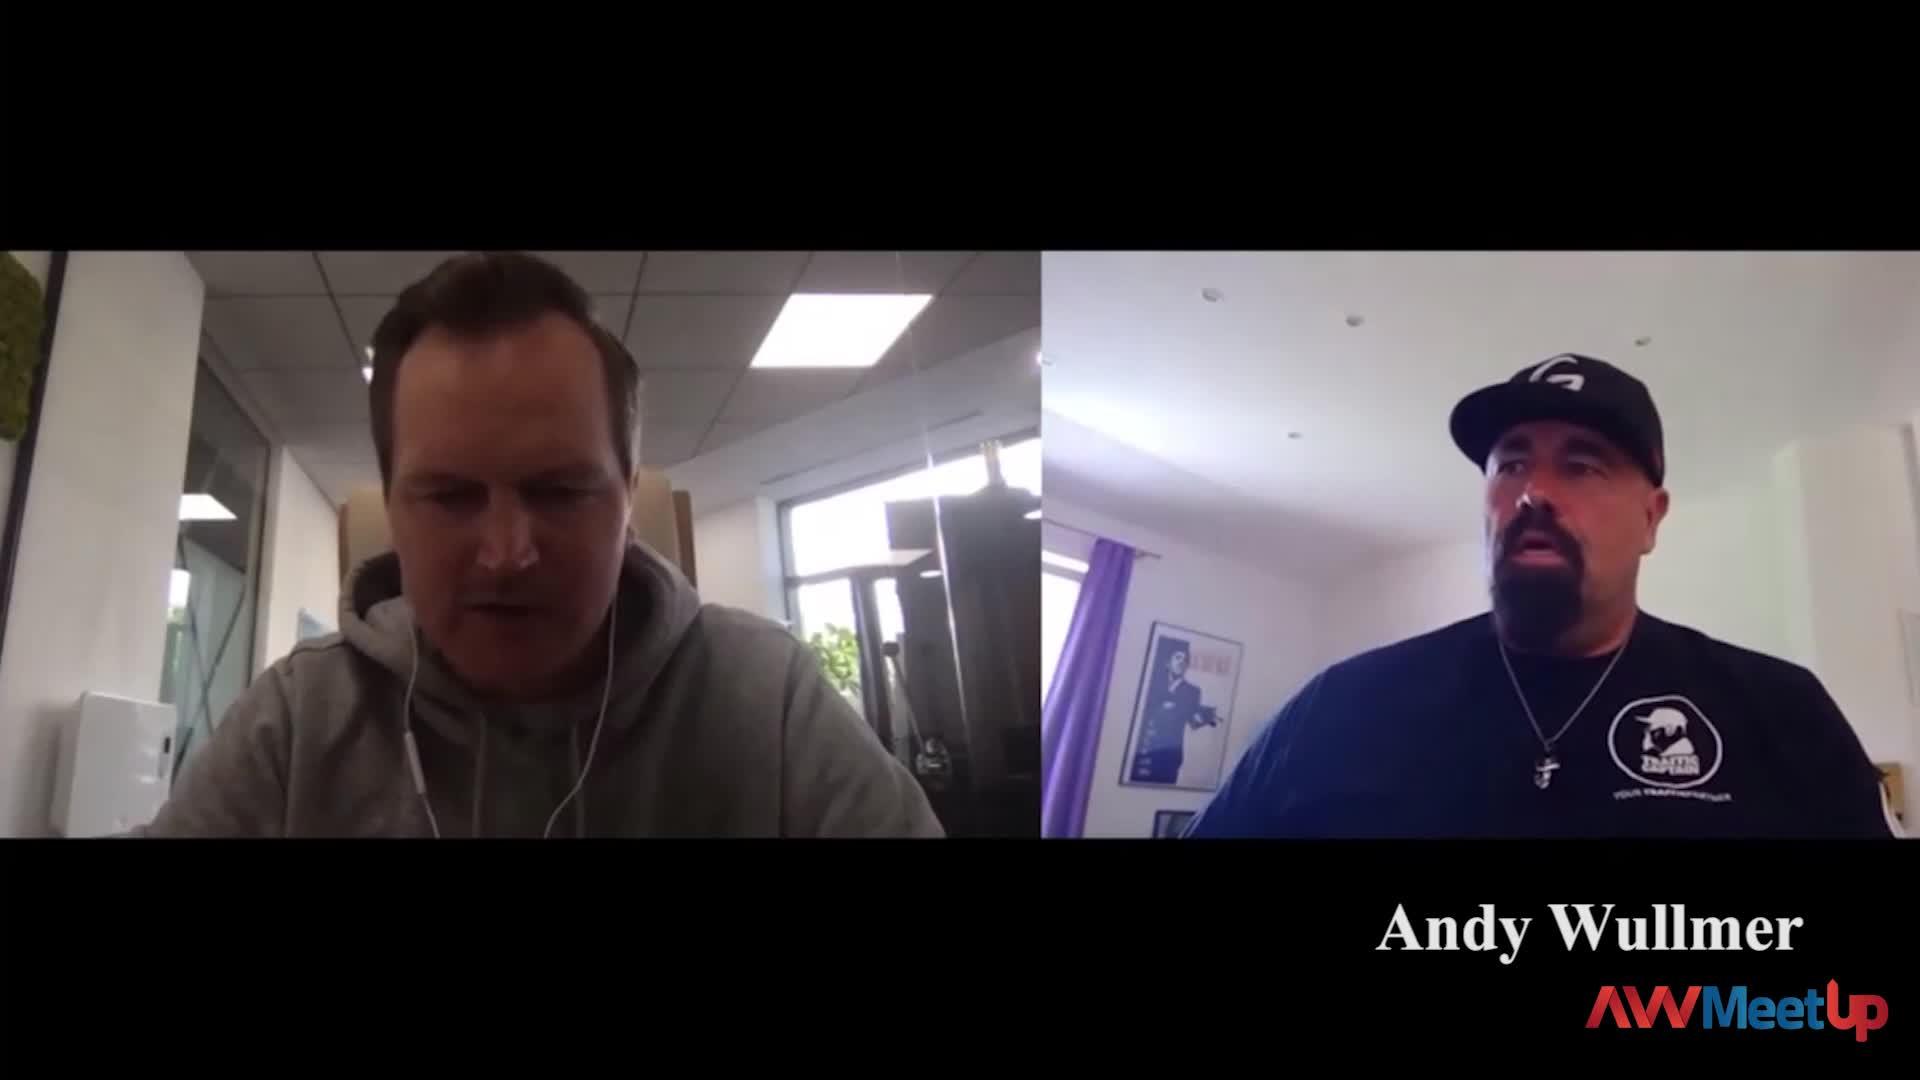 AWMeetup Day 1 Talkshow with Thomas Skavhellen #2 - thumbnail